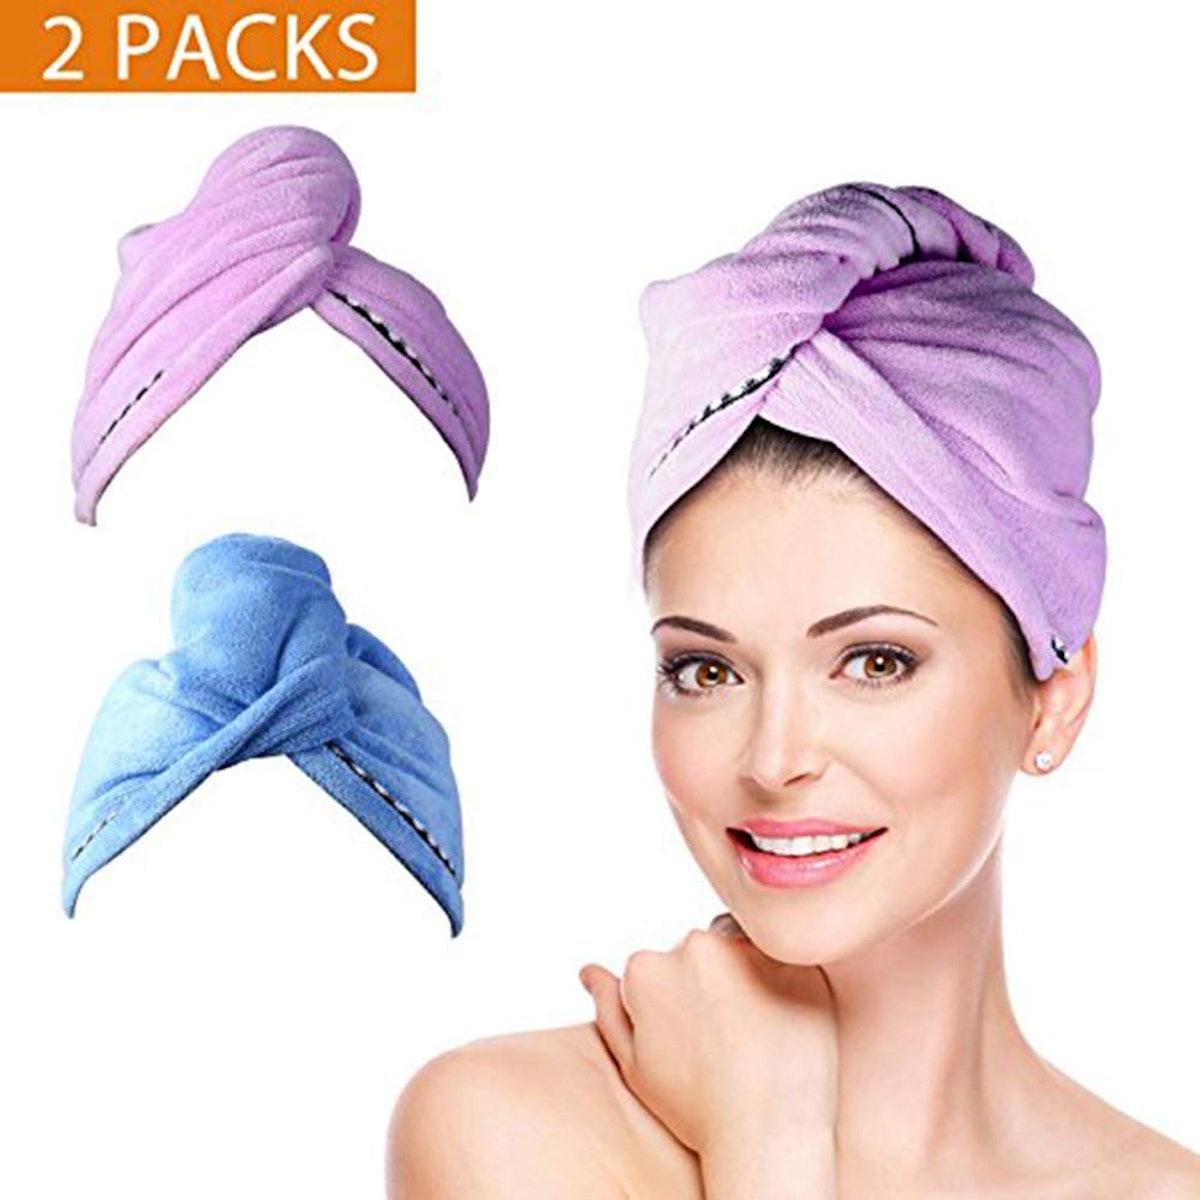 Duomishu Hair Towel Wraps (2-Pack)